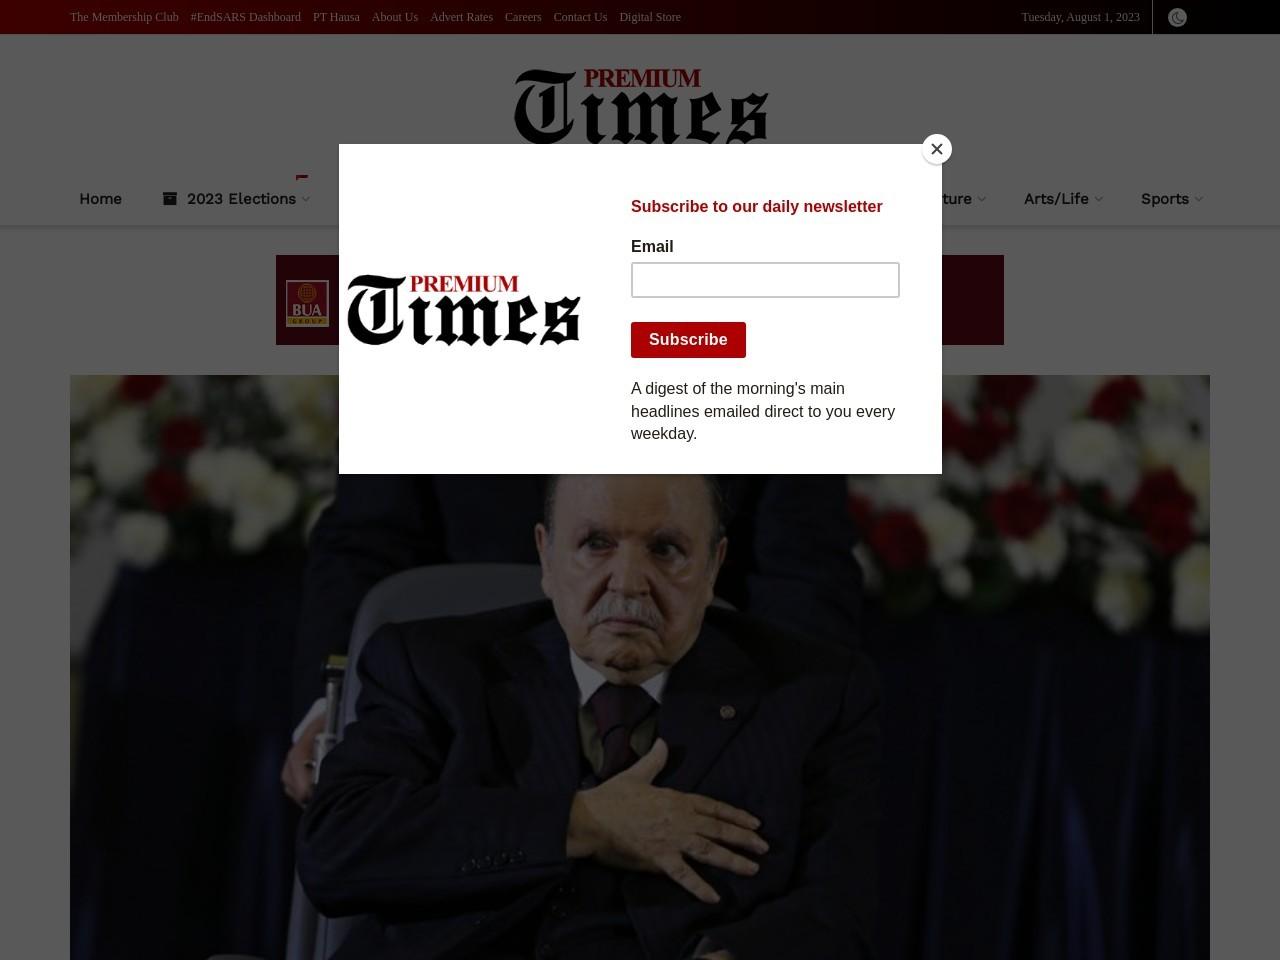 Algeria's Bouteflika sacks two generals to ease grip on power – Sources